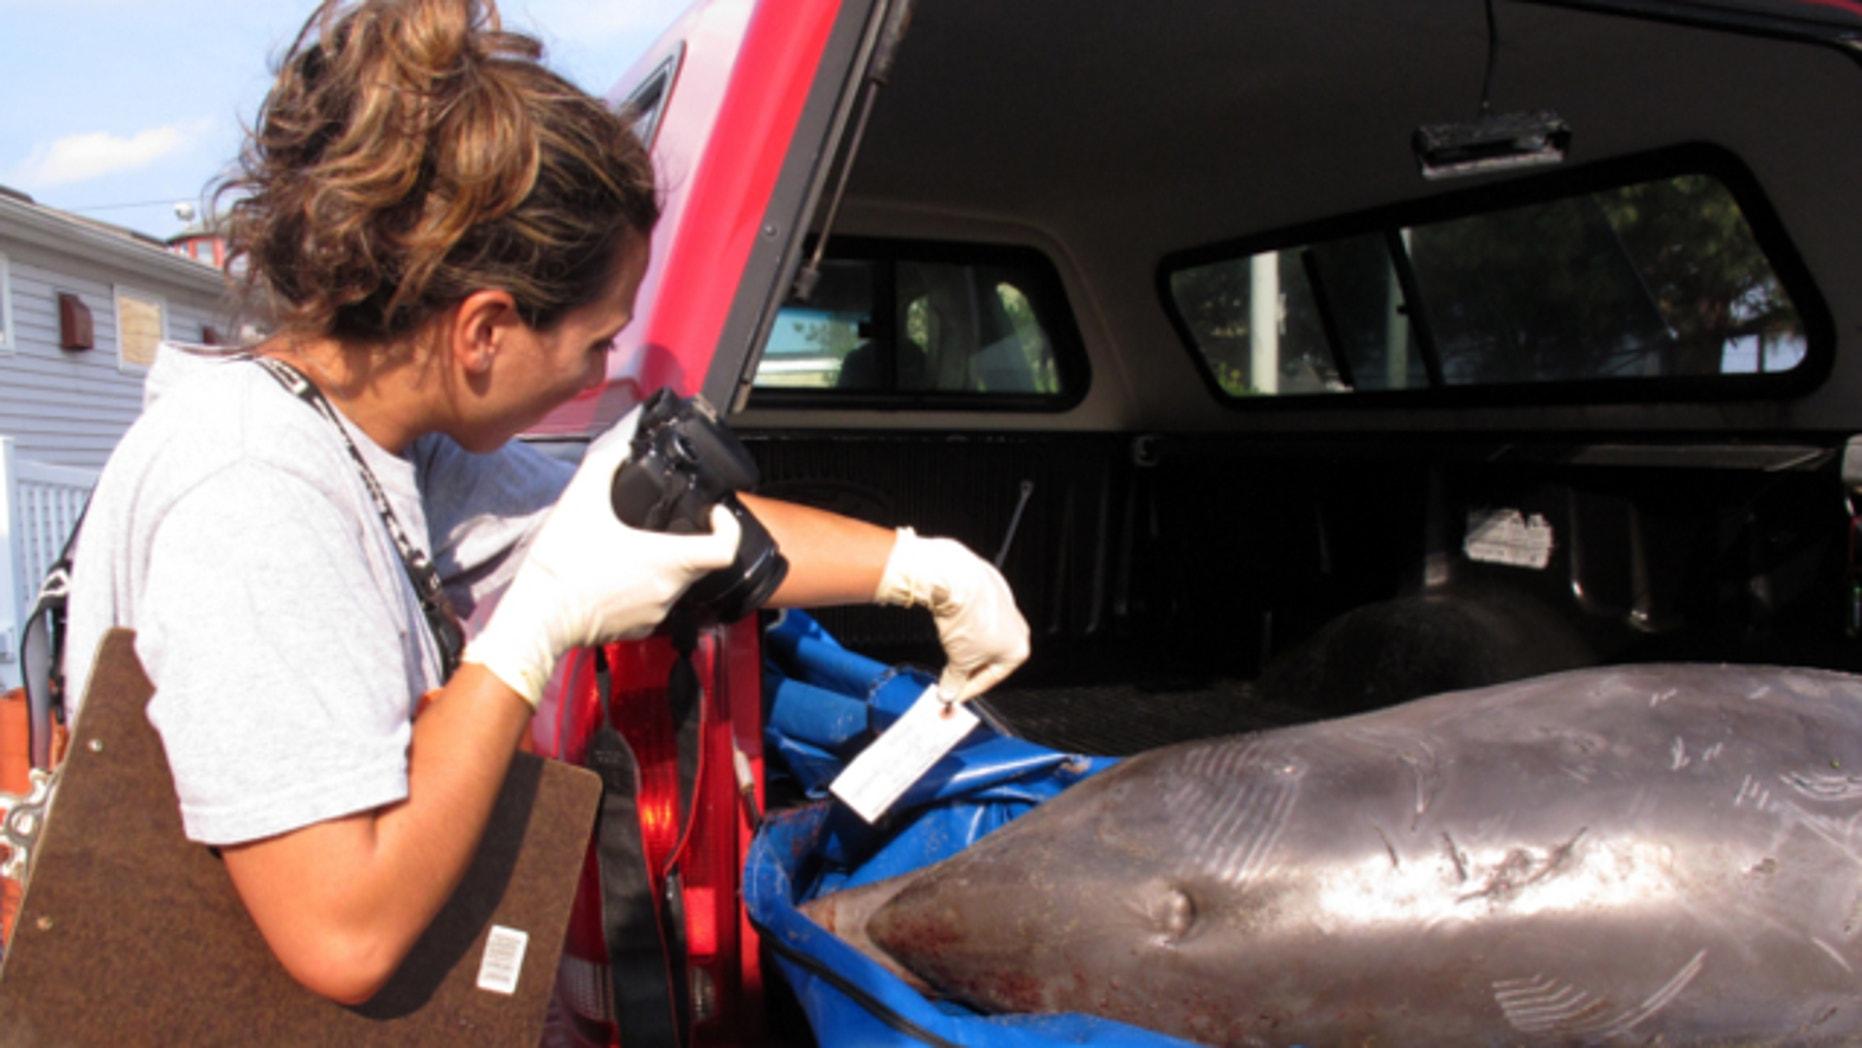 Aug. 1, 2013: From right, Virginia Aquarium Stranding Response Team members Krystal Rodrique of Virginia Beach, Va. and intern Liz Schell of Durango, Co. load a deceased male dolphin onto a metal stretcher on Ocean View Beach in Norfolk, Va.